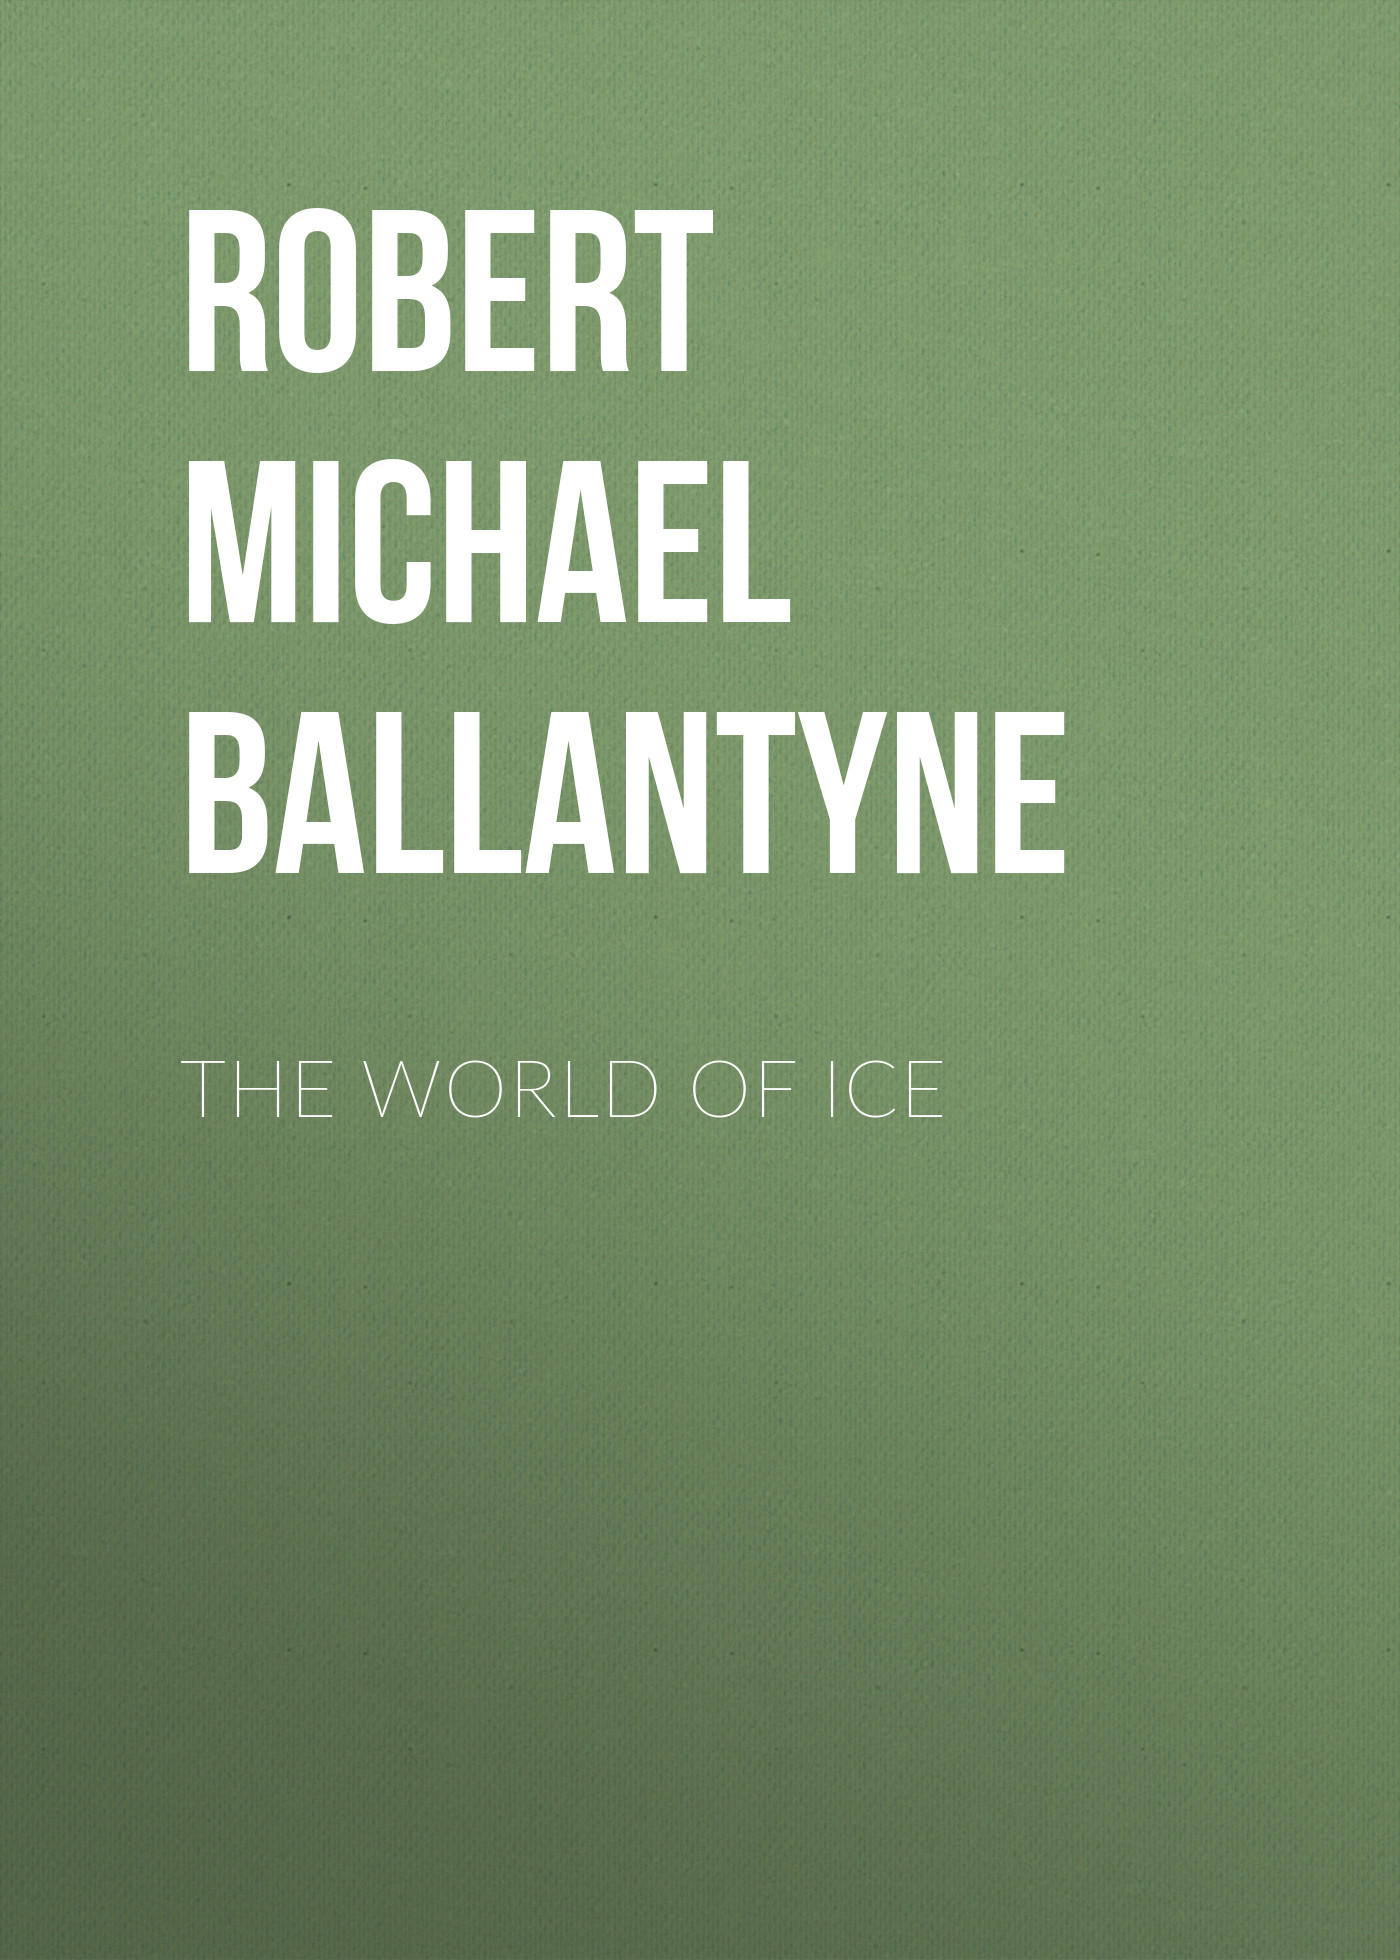 цены на Robert Michael Ballantyne The World of Ice в интернет-магазинах